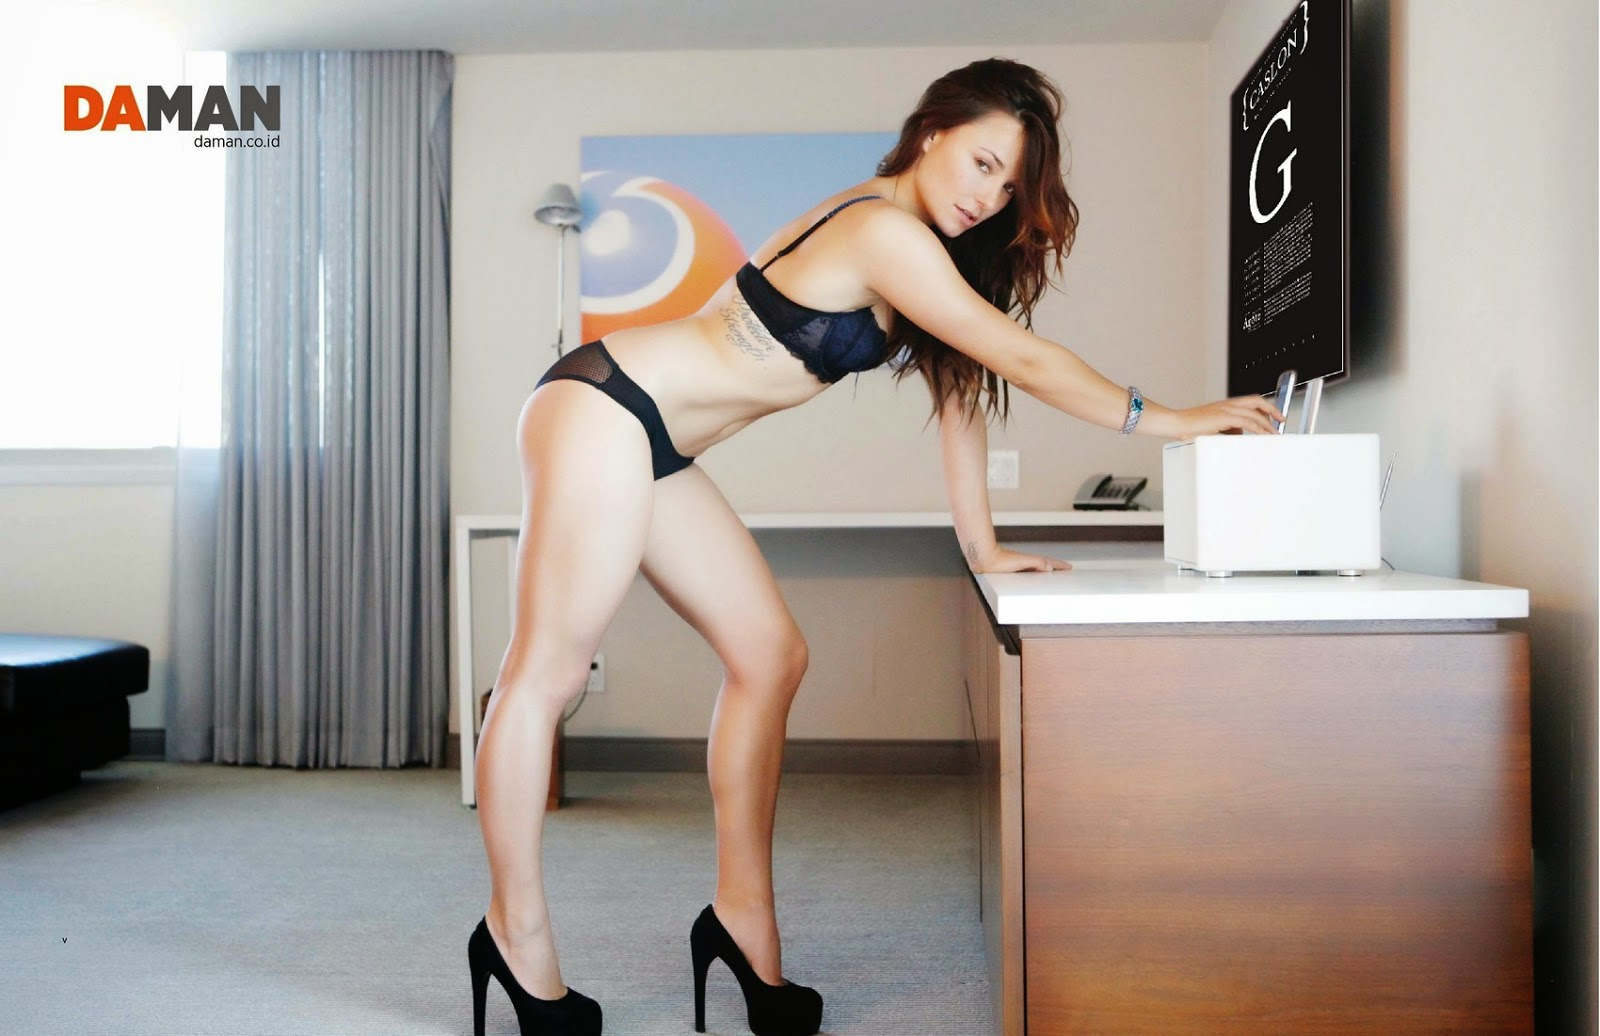 Sideboobs TheFappening Briana Evigan naked photo 2017